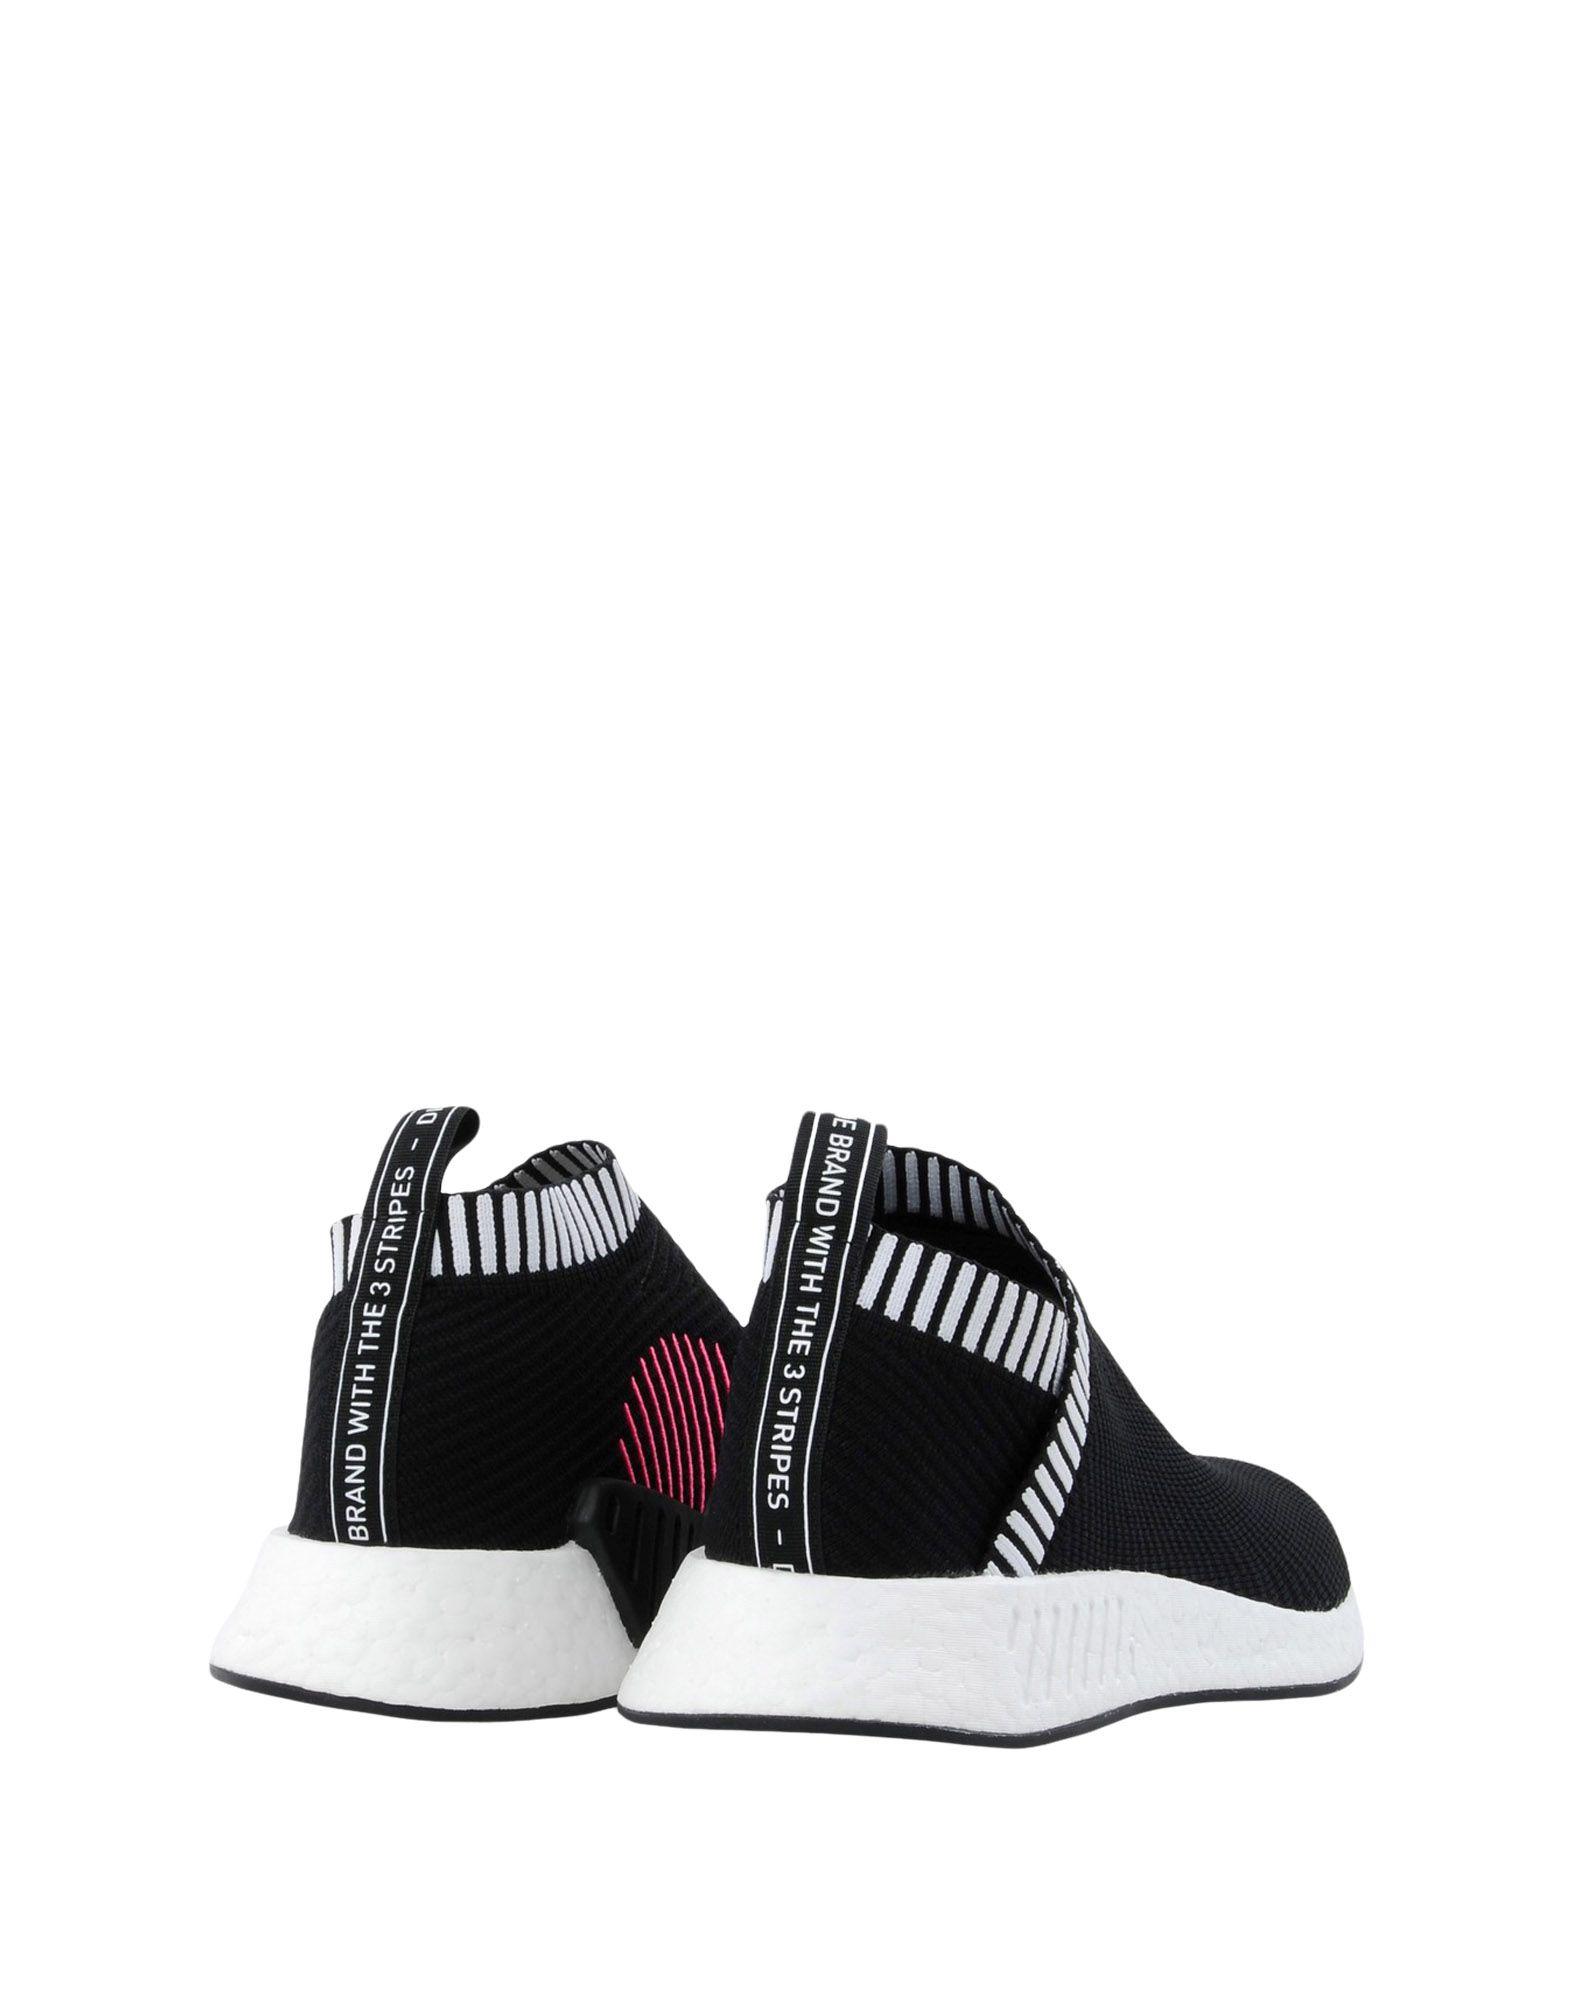 Adidas Originals Nmd_Cs2 Pk  11281378JP